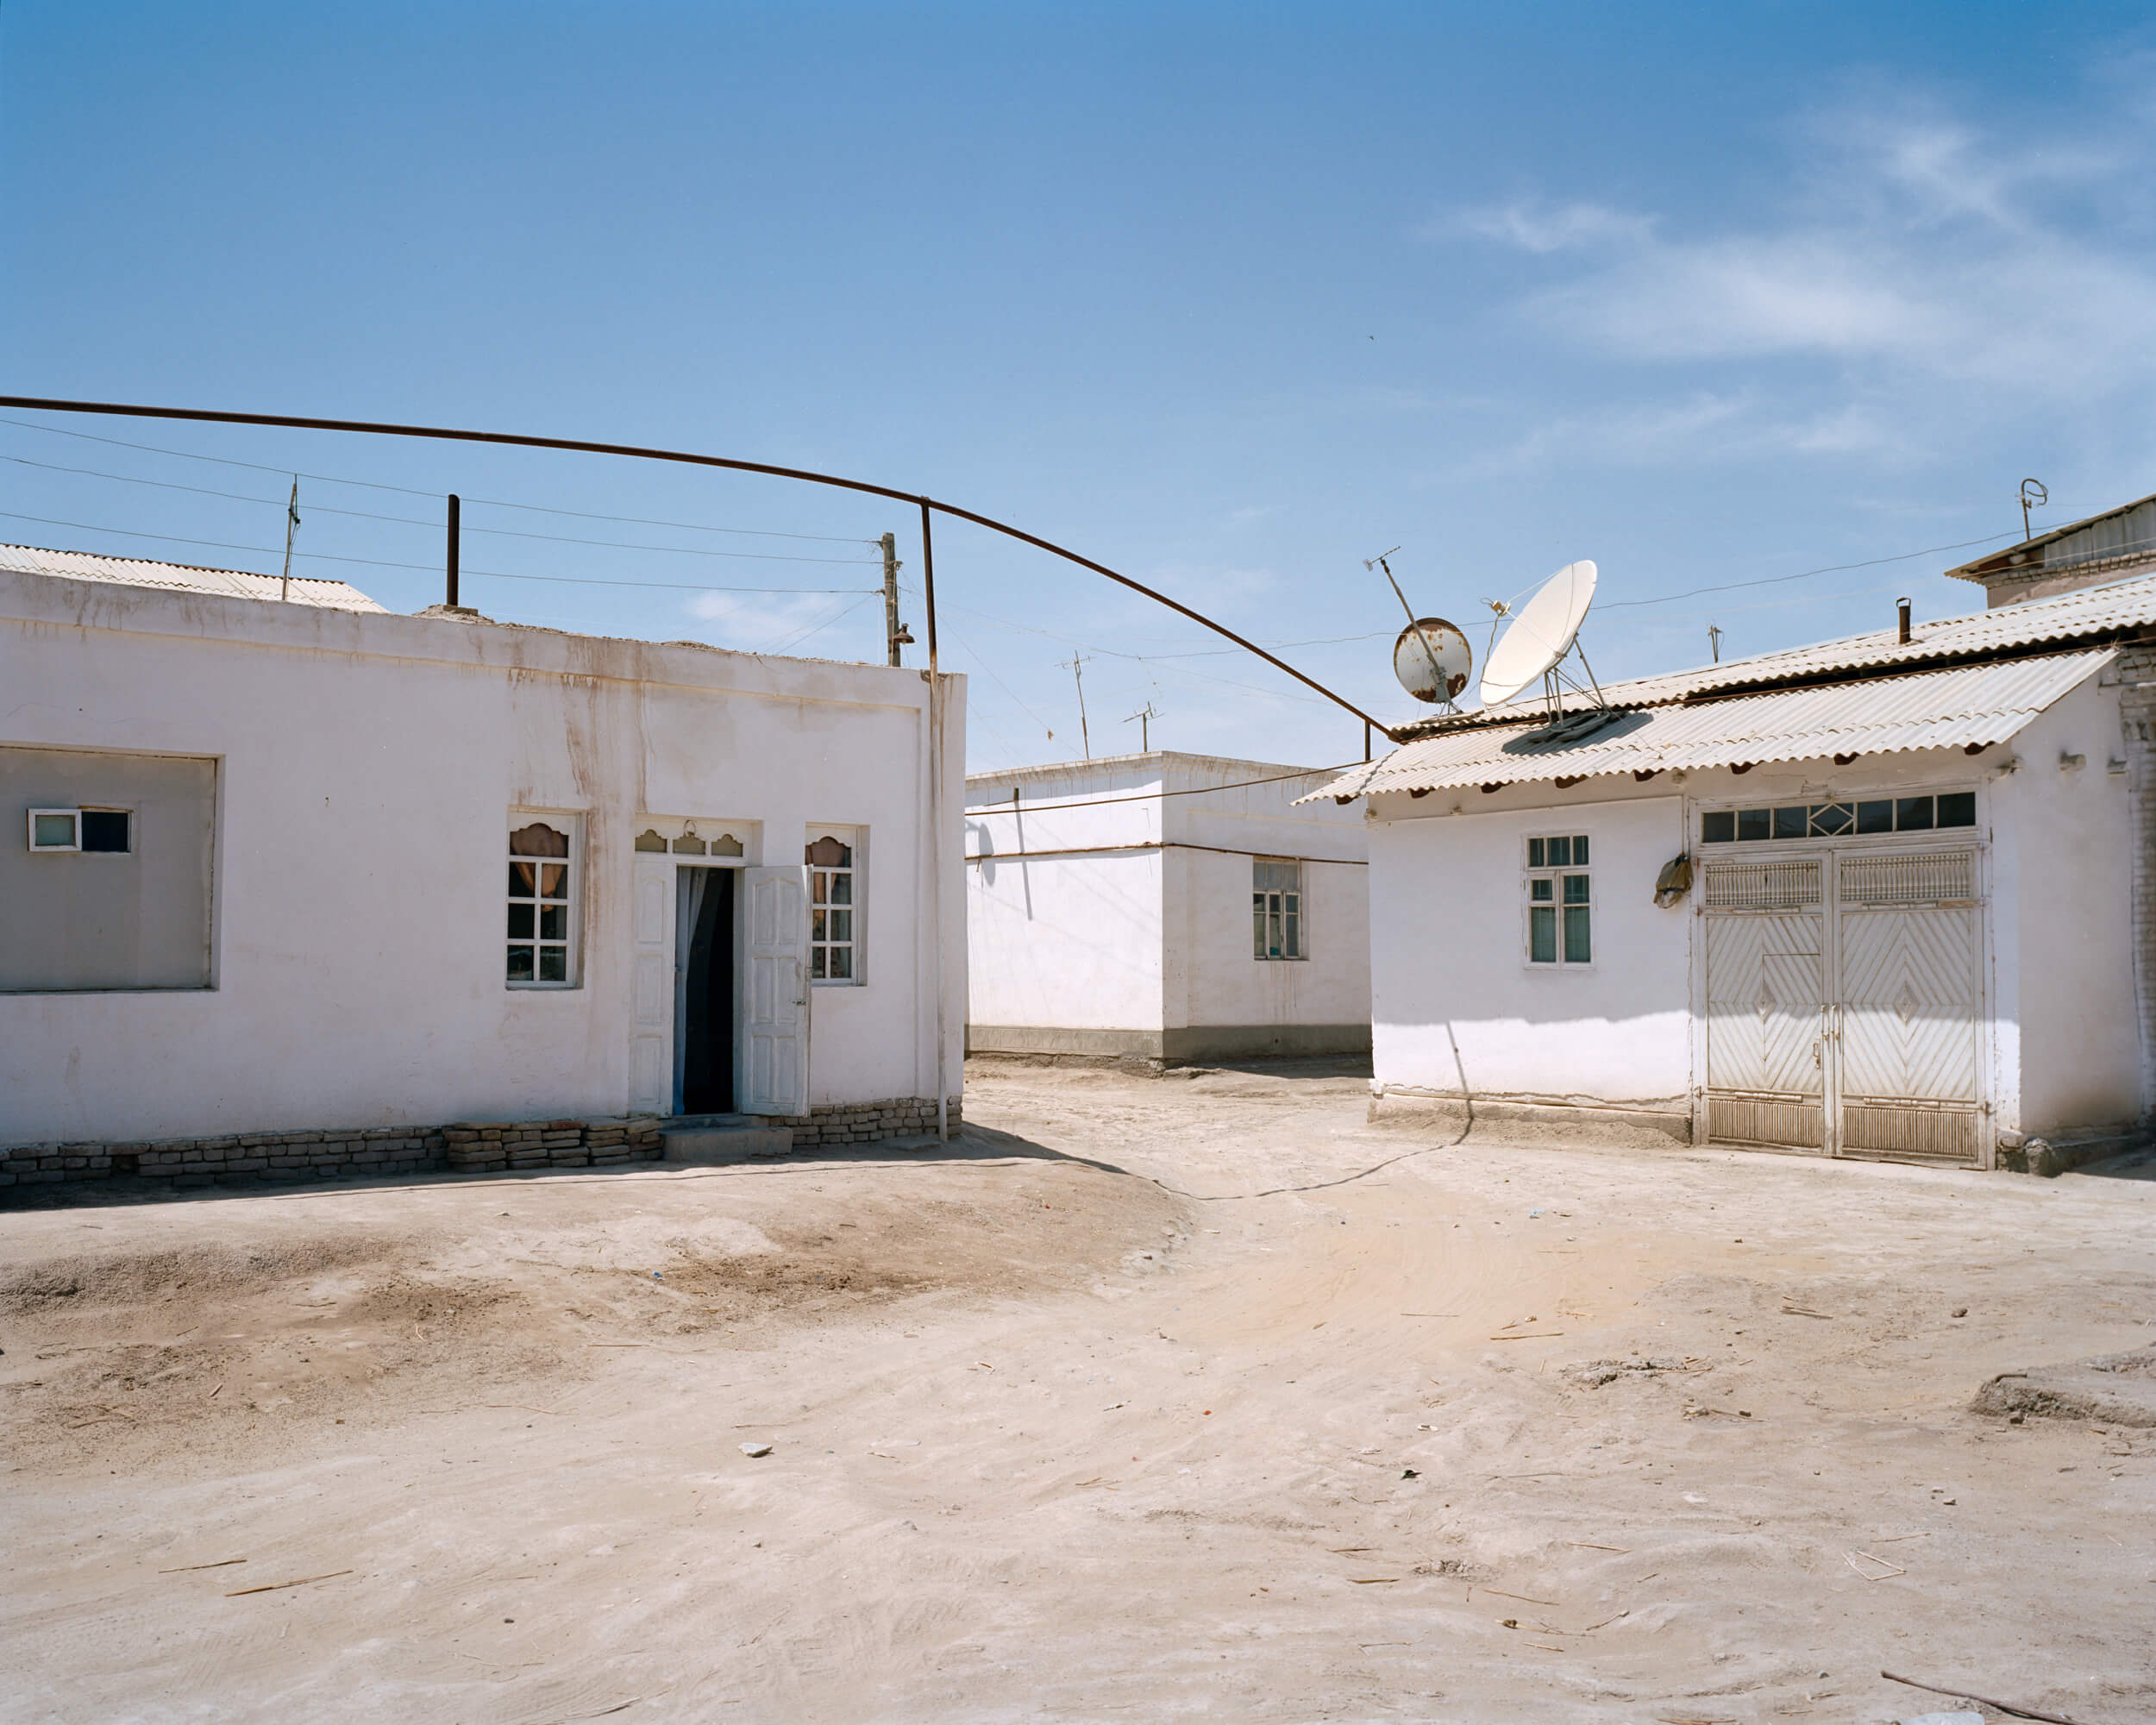 marco-barbieri-water-in-the-desert-28.jpg